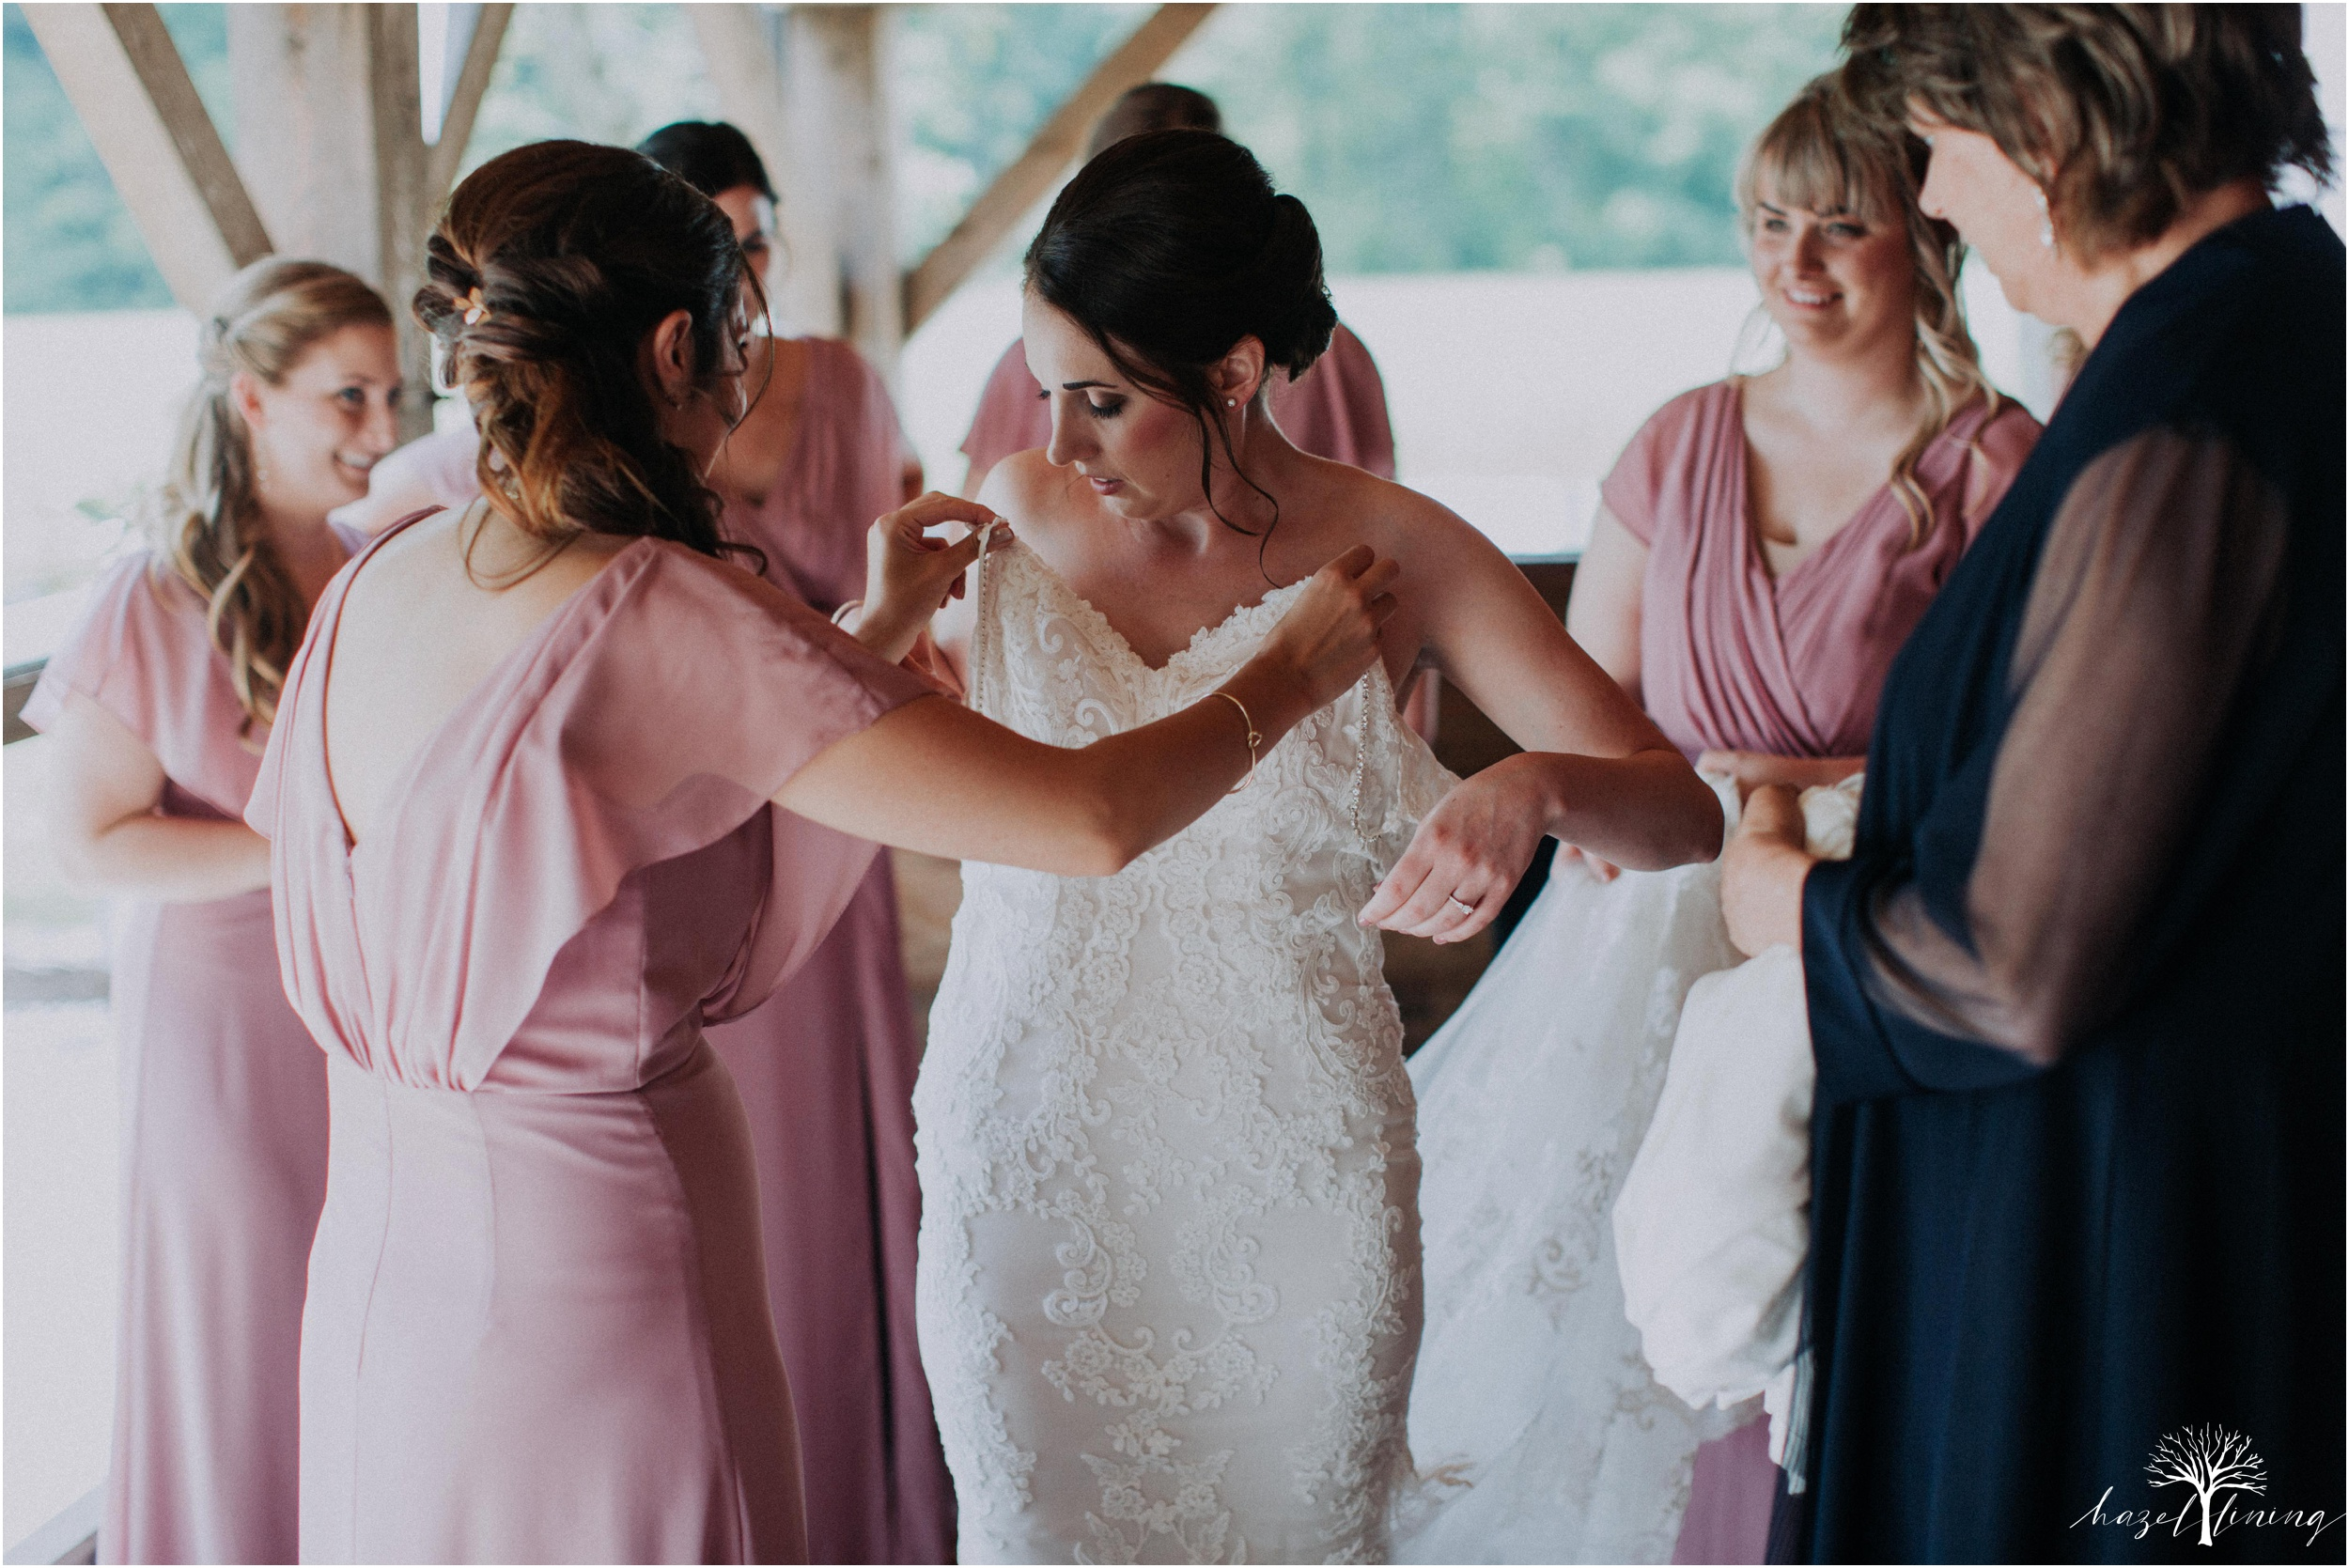 hazel-lining-travel-wedding-elopement-photography-lisa-landon-shoemaker-the-farm-bakery-and-events-bucks-county-quakertown-pennsylvania-summer-country-outdoor-farm-wedding_0007.jpg